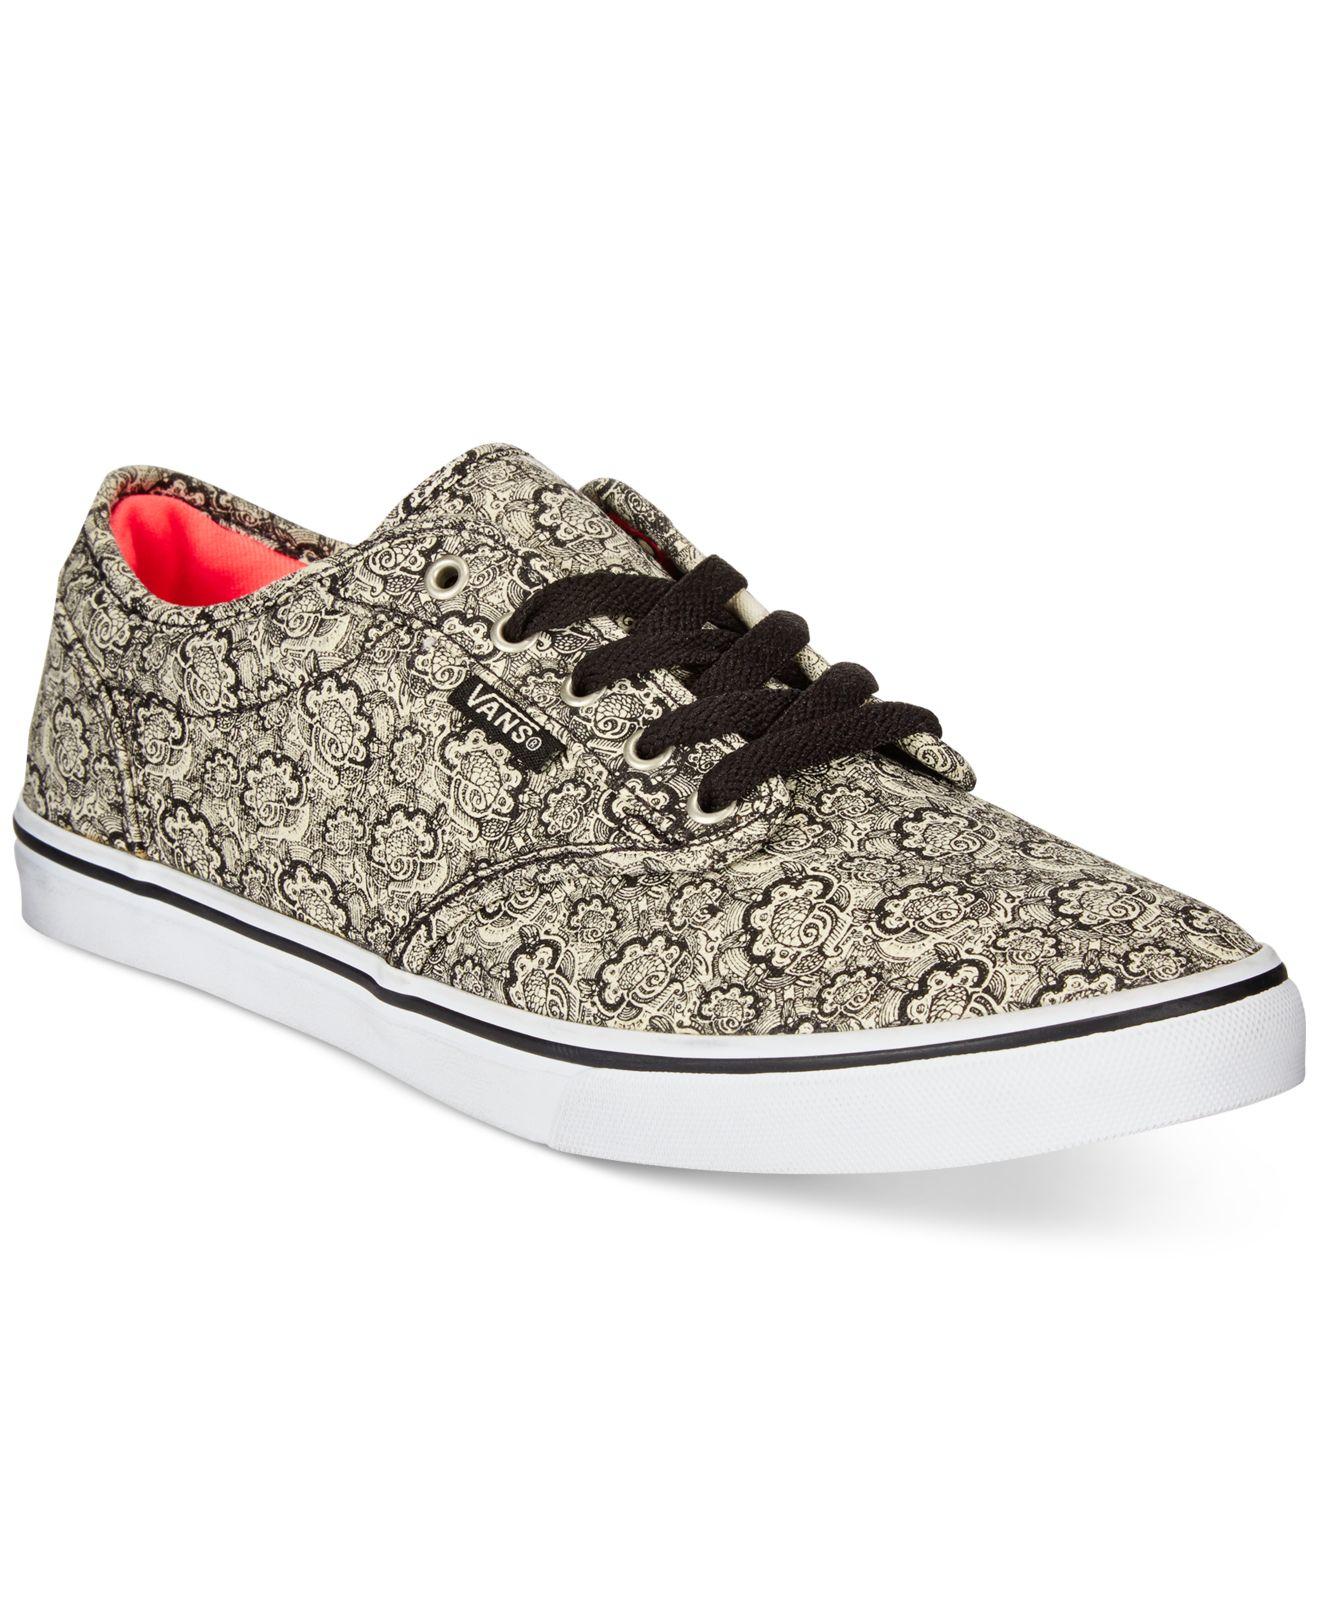 0ee1648172 Lyst - Vans Women s Atwood Low Henna Sneakers in Black